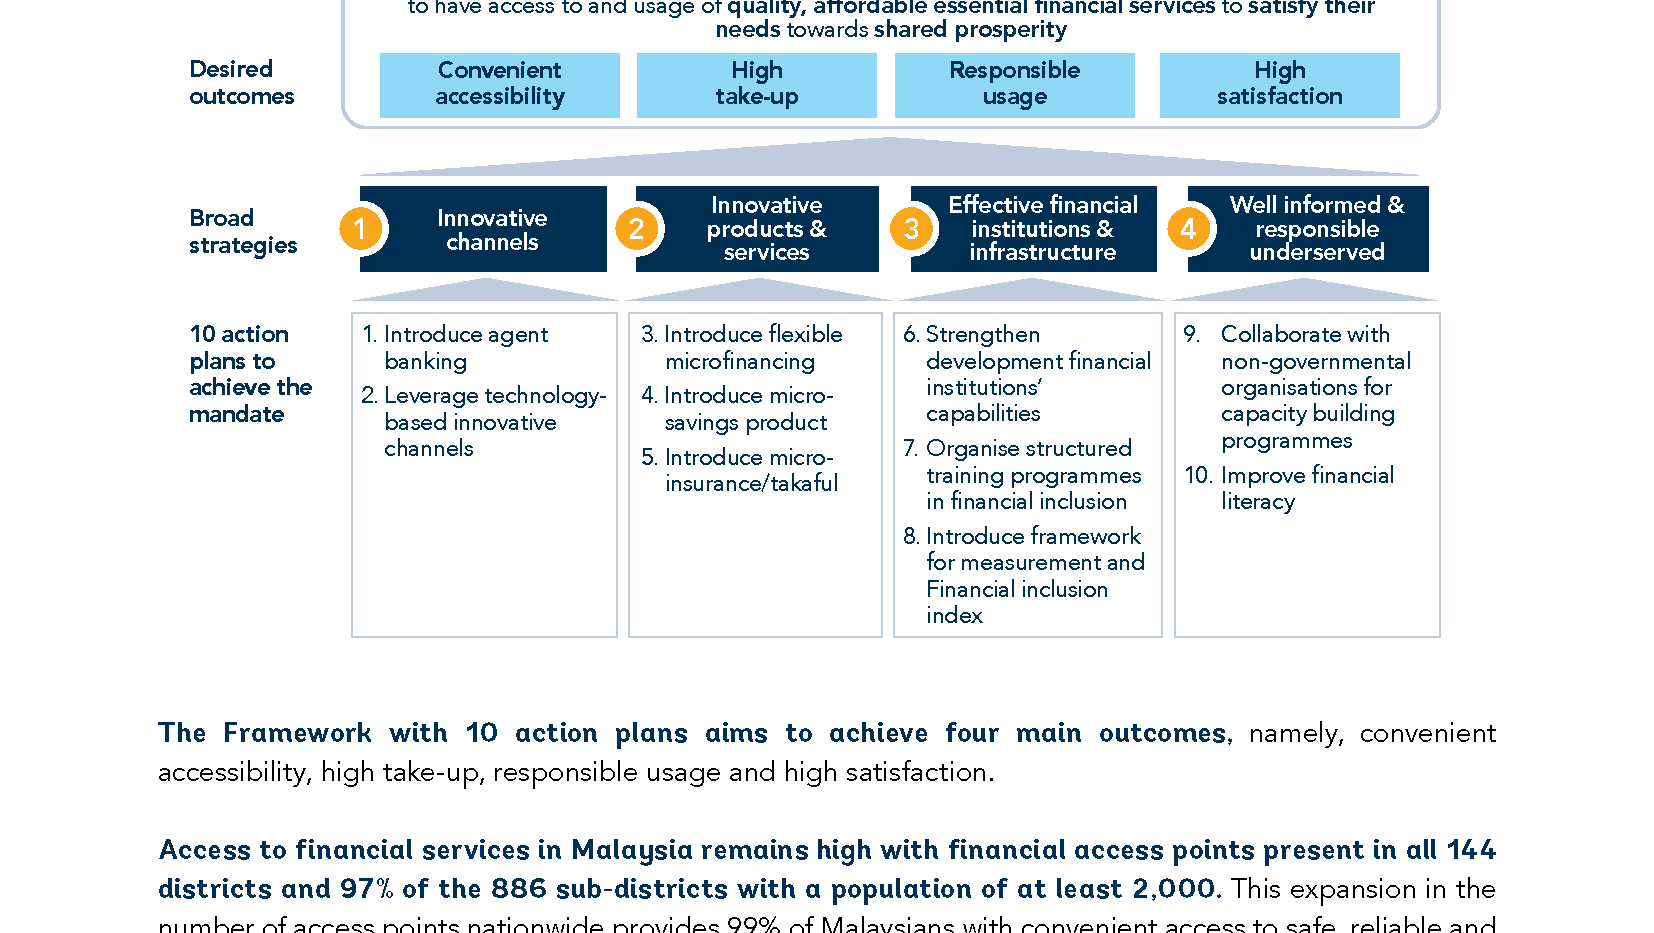 World Bank: Islamic Finance & Financial Inclusiveness (Inside Sample 3)